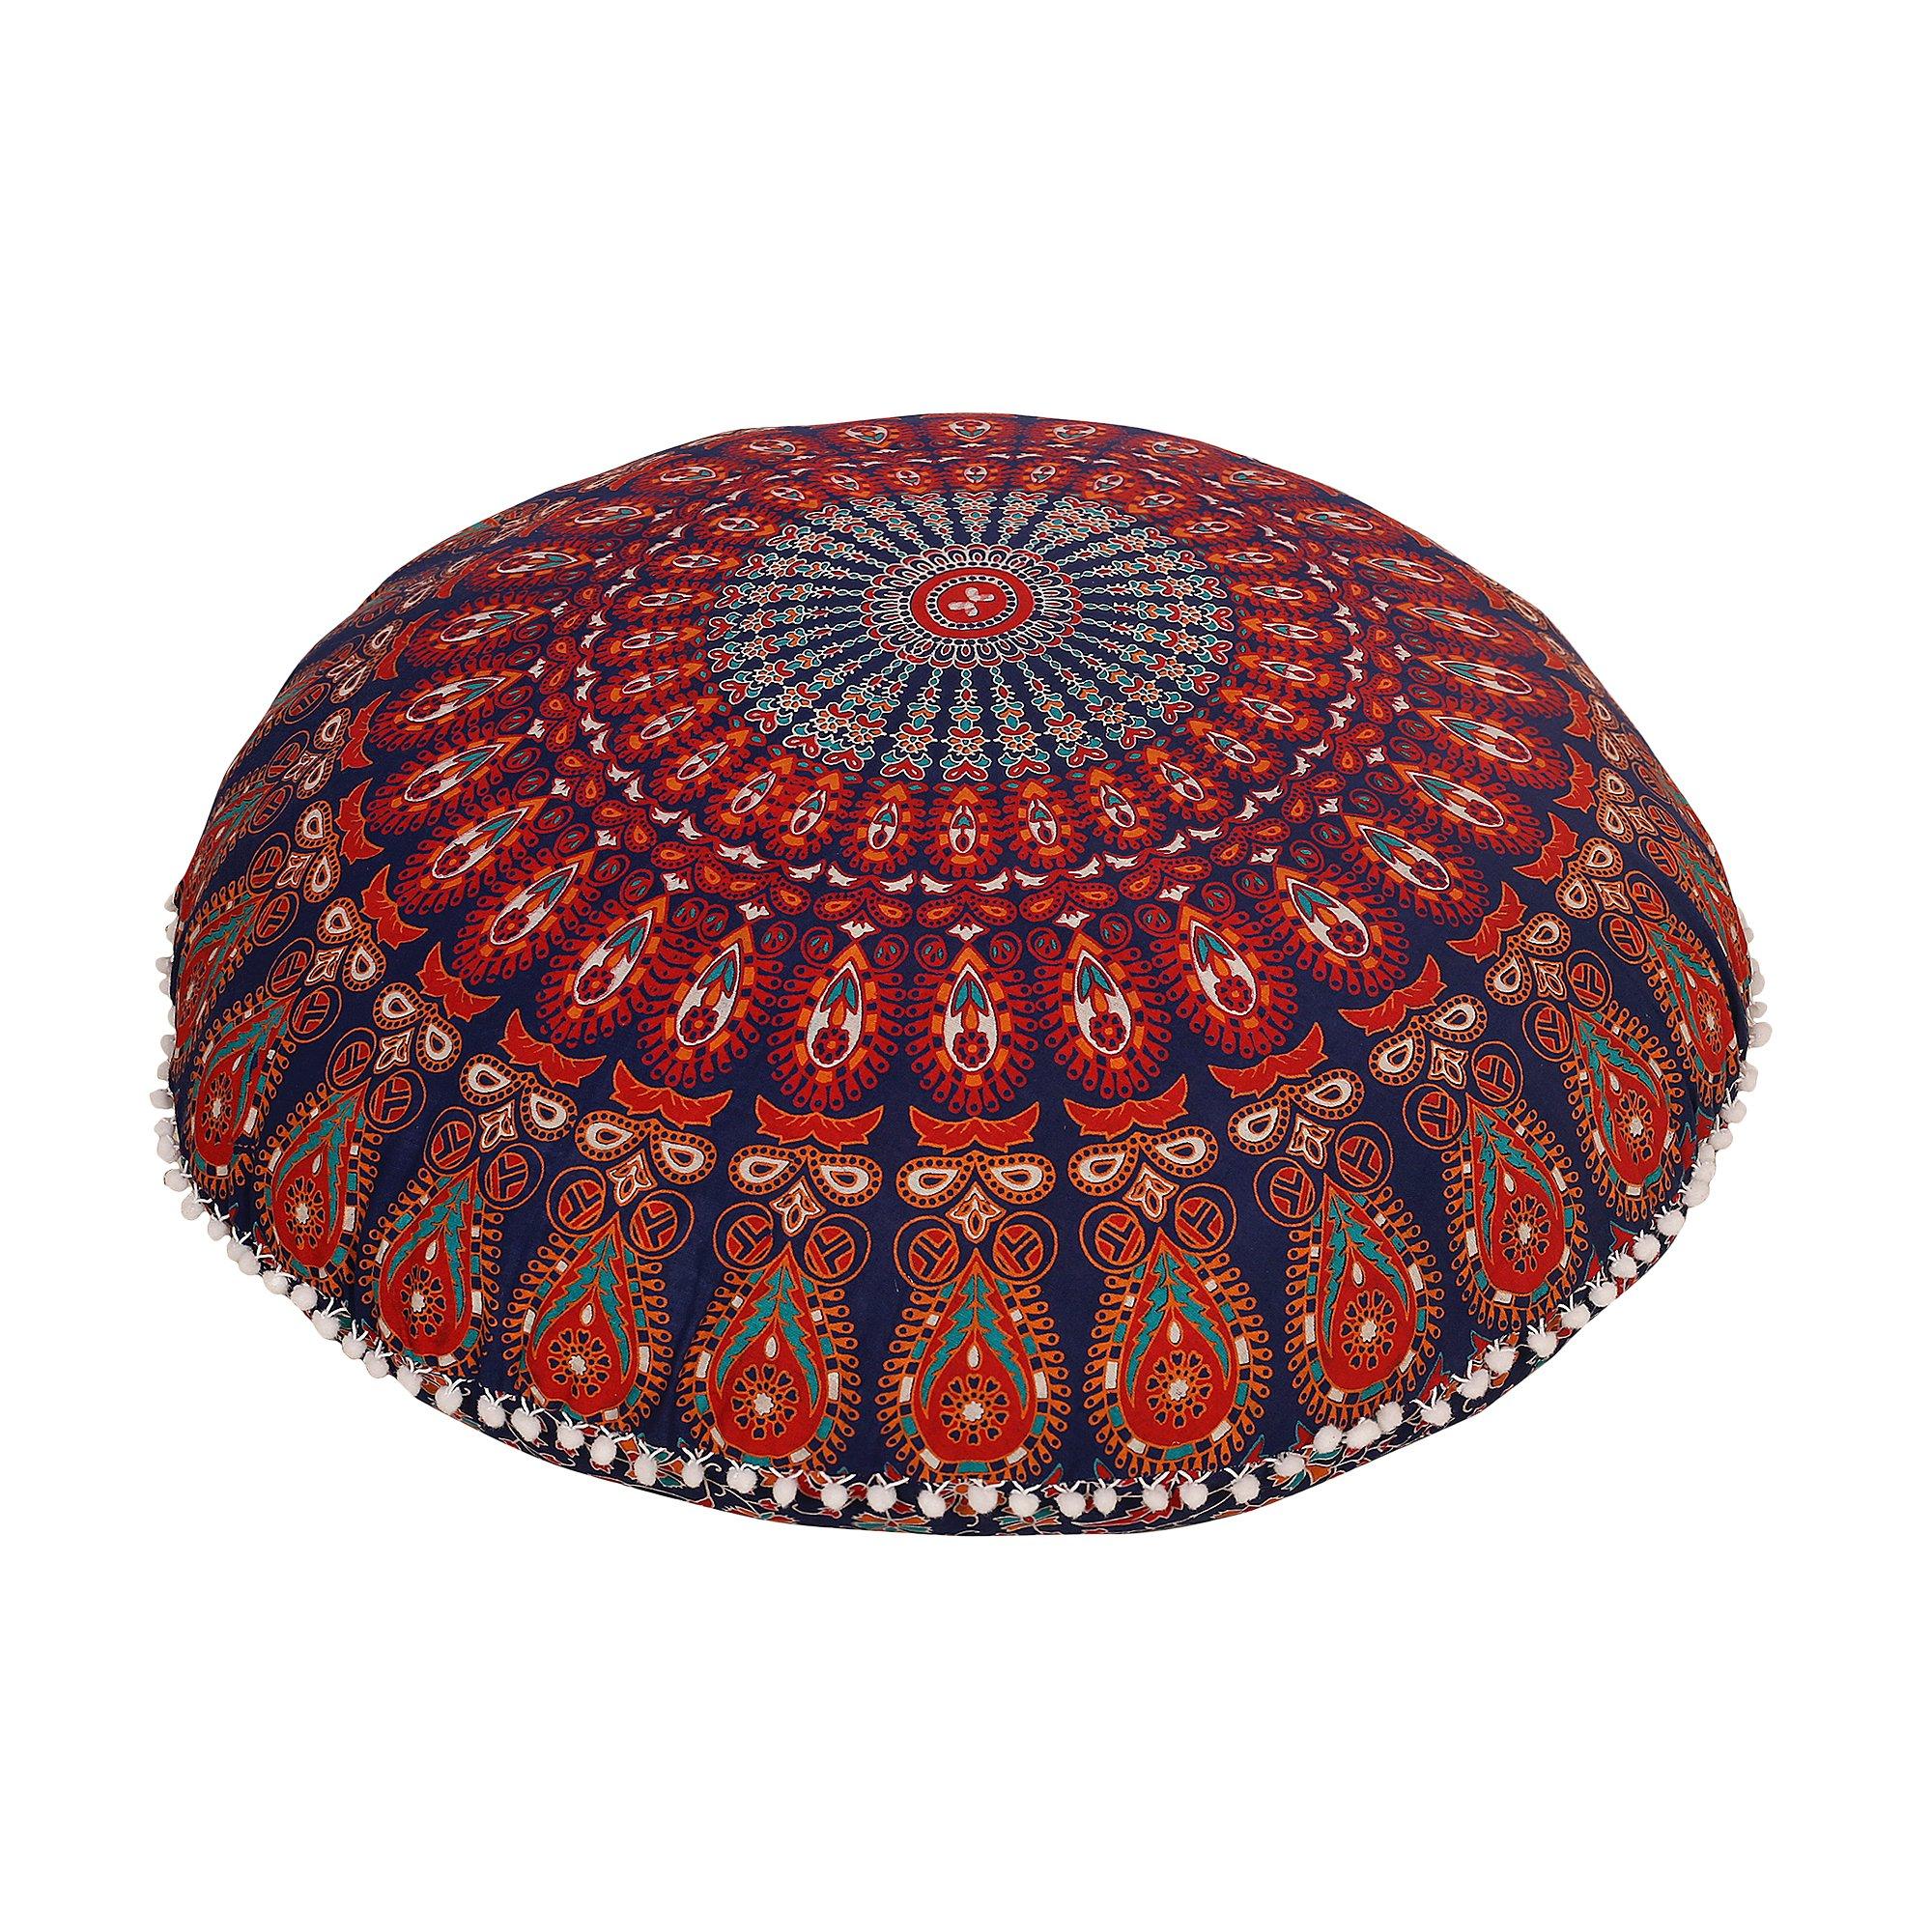 Navy Blue Round Mandala Floor Pillow Throw Living Room Decor Boho Decor Hippie Round Seating Pouf Cover Mandala Floor Pillows Cushion With Pom Pom